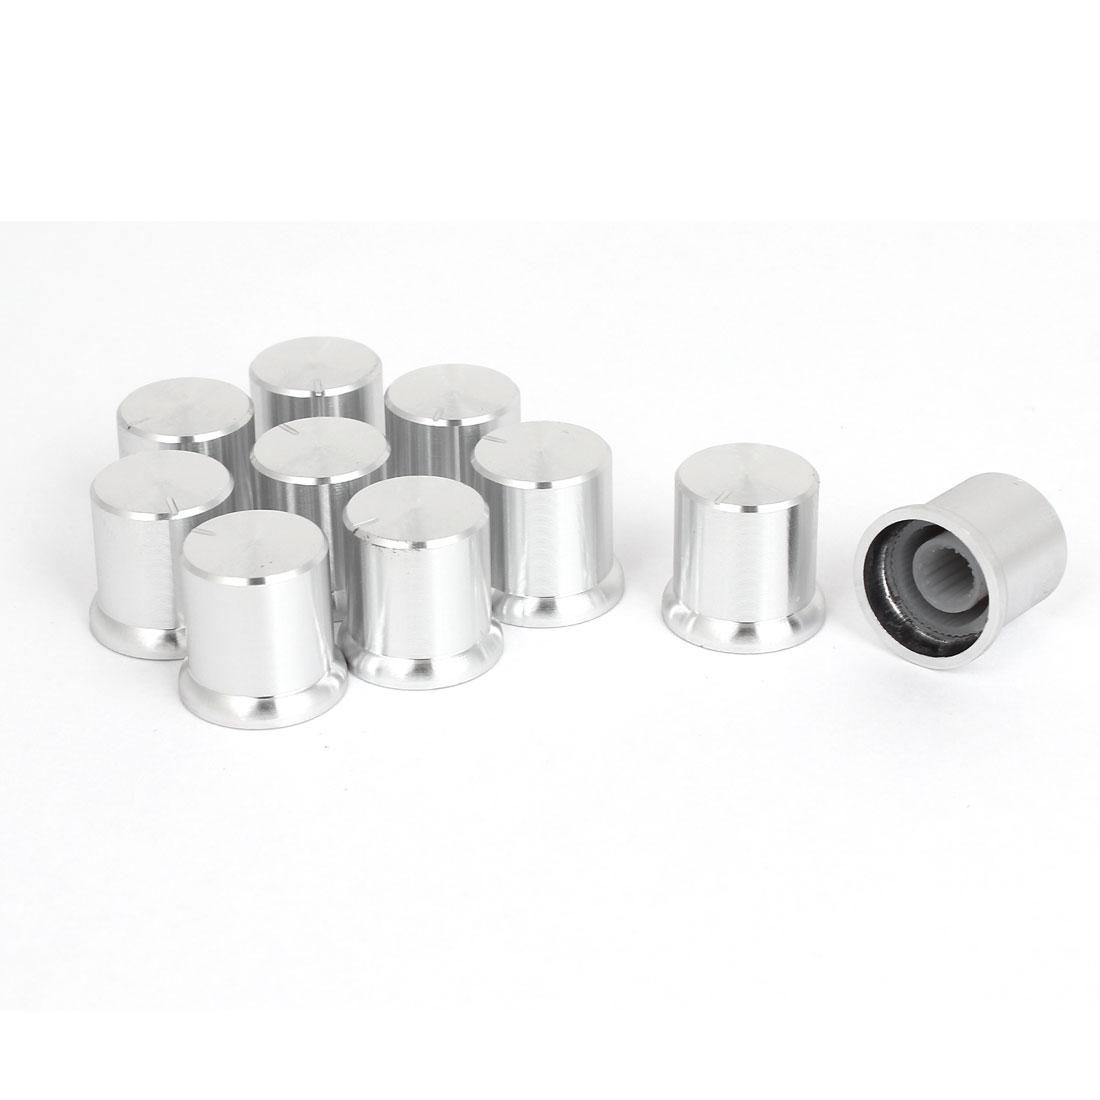 10pcs 17x16mm Silver Tone Aluminum Alloy Rotary Potentiometer Knobs Cap